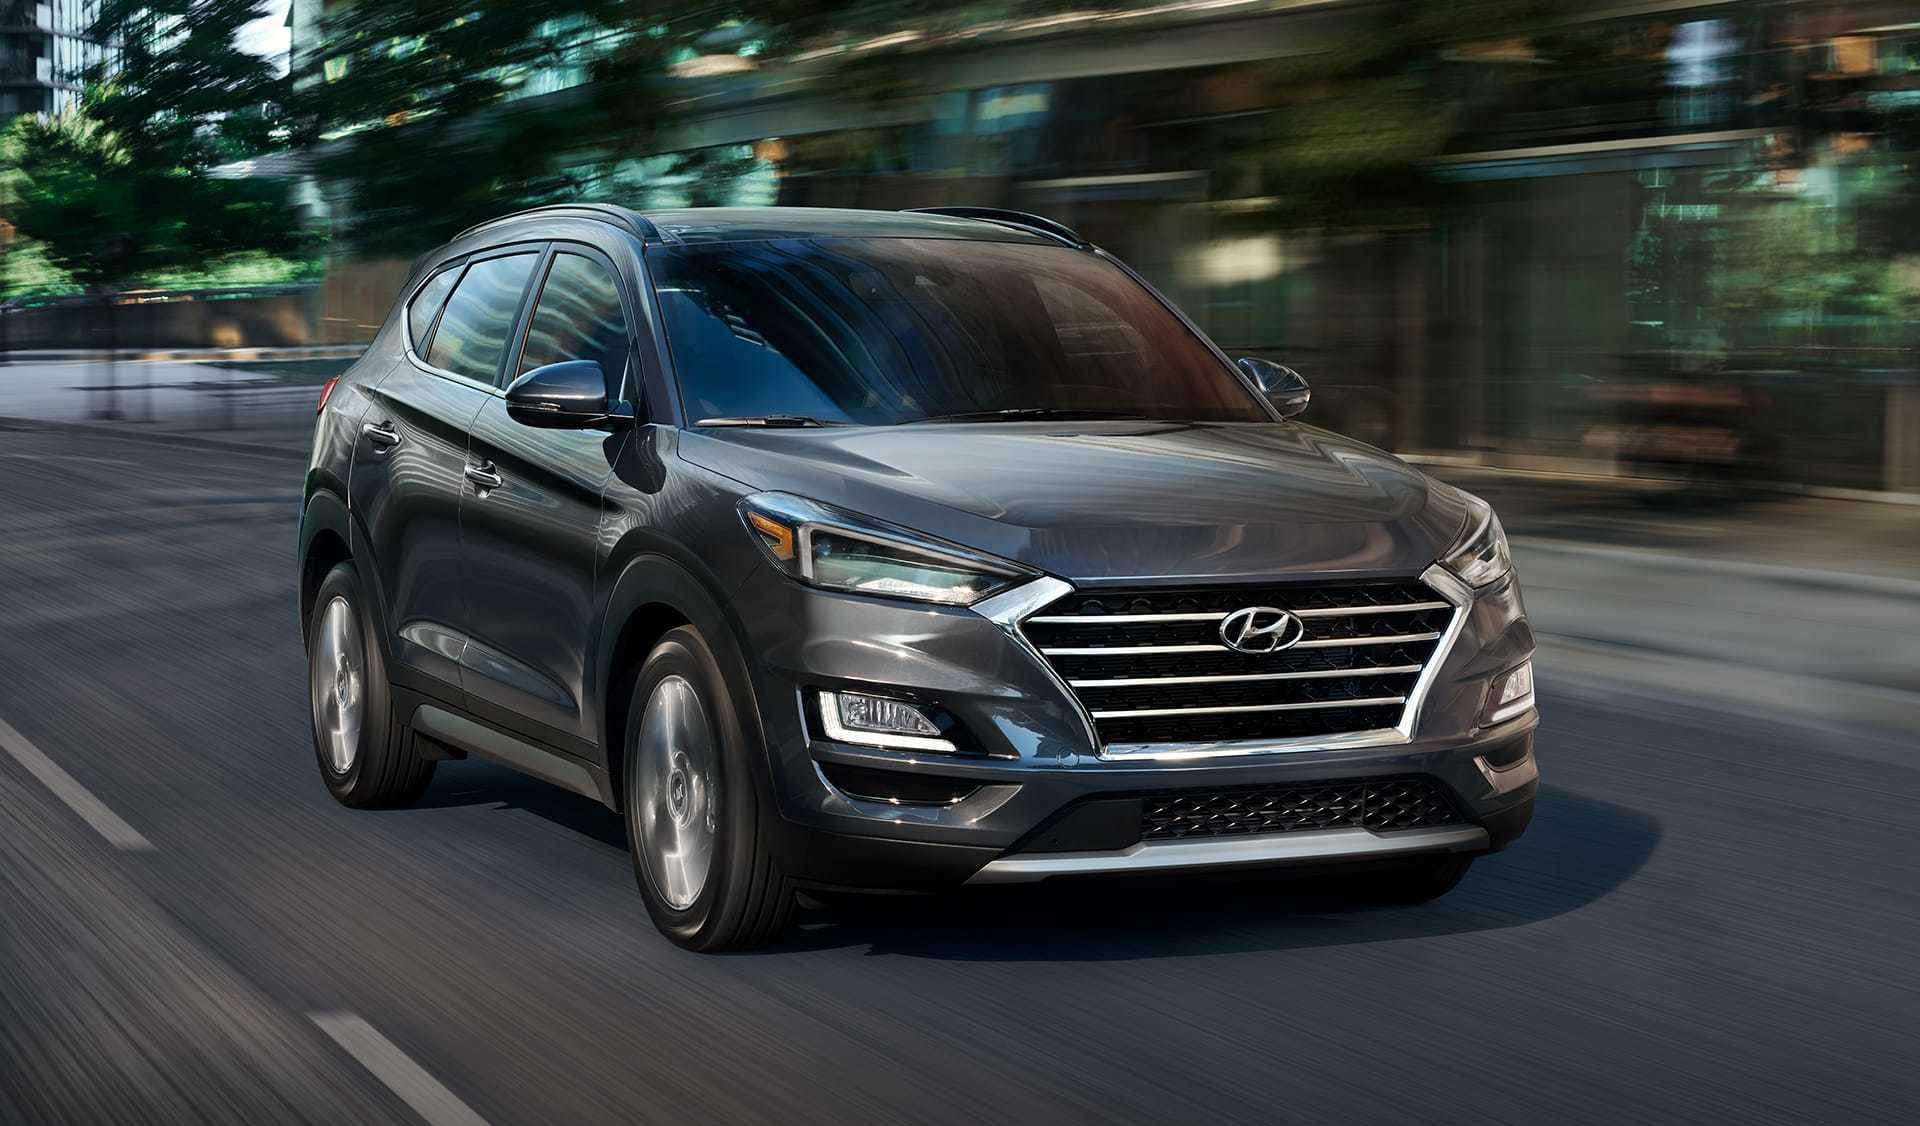 2020 Hyundai Tucson Leasing near Manassas, VA